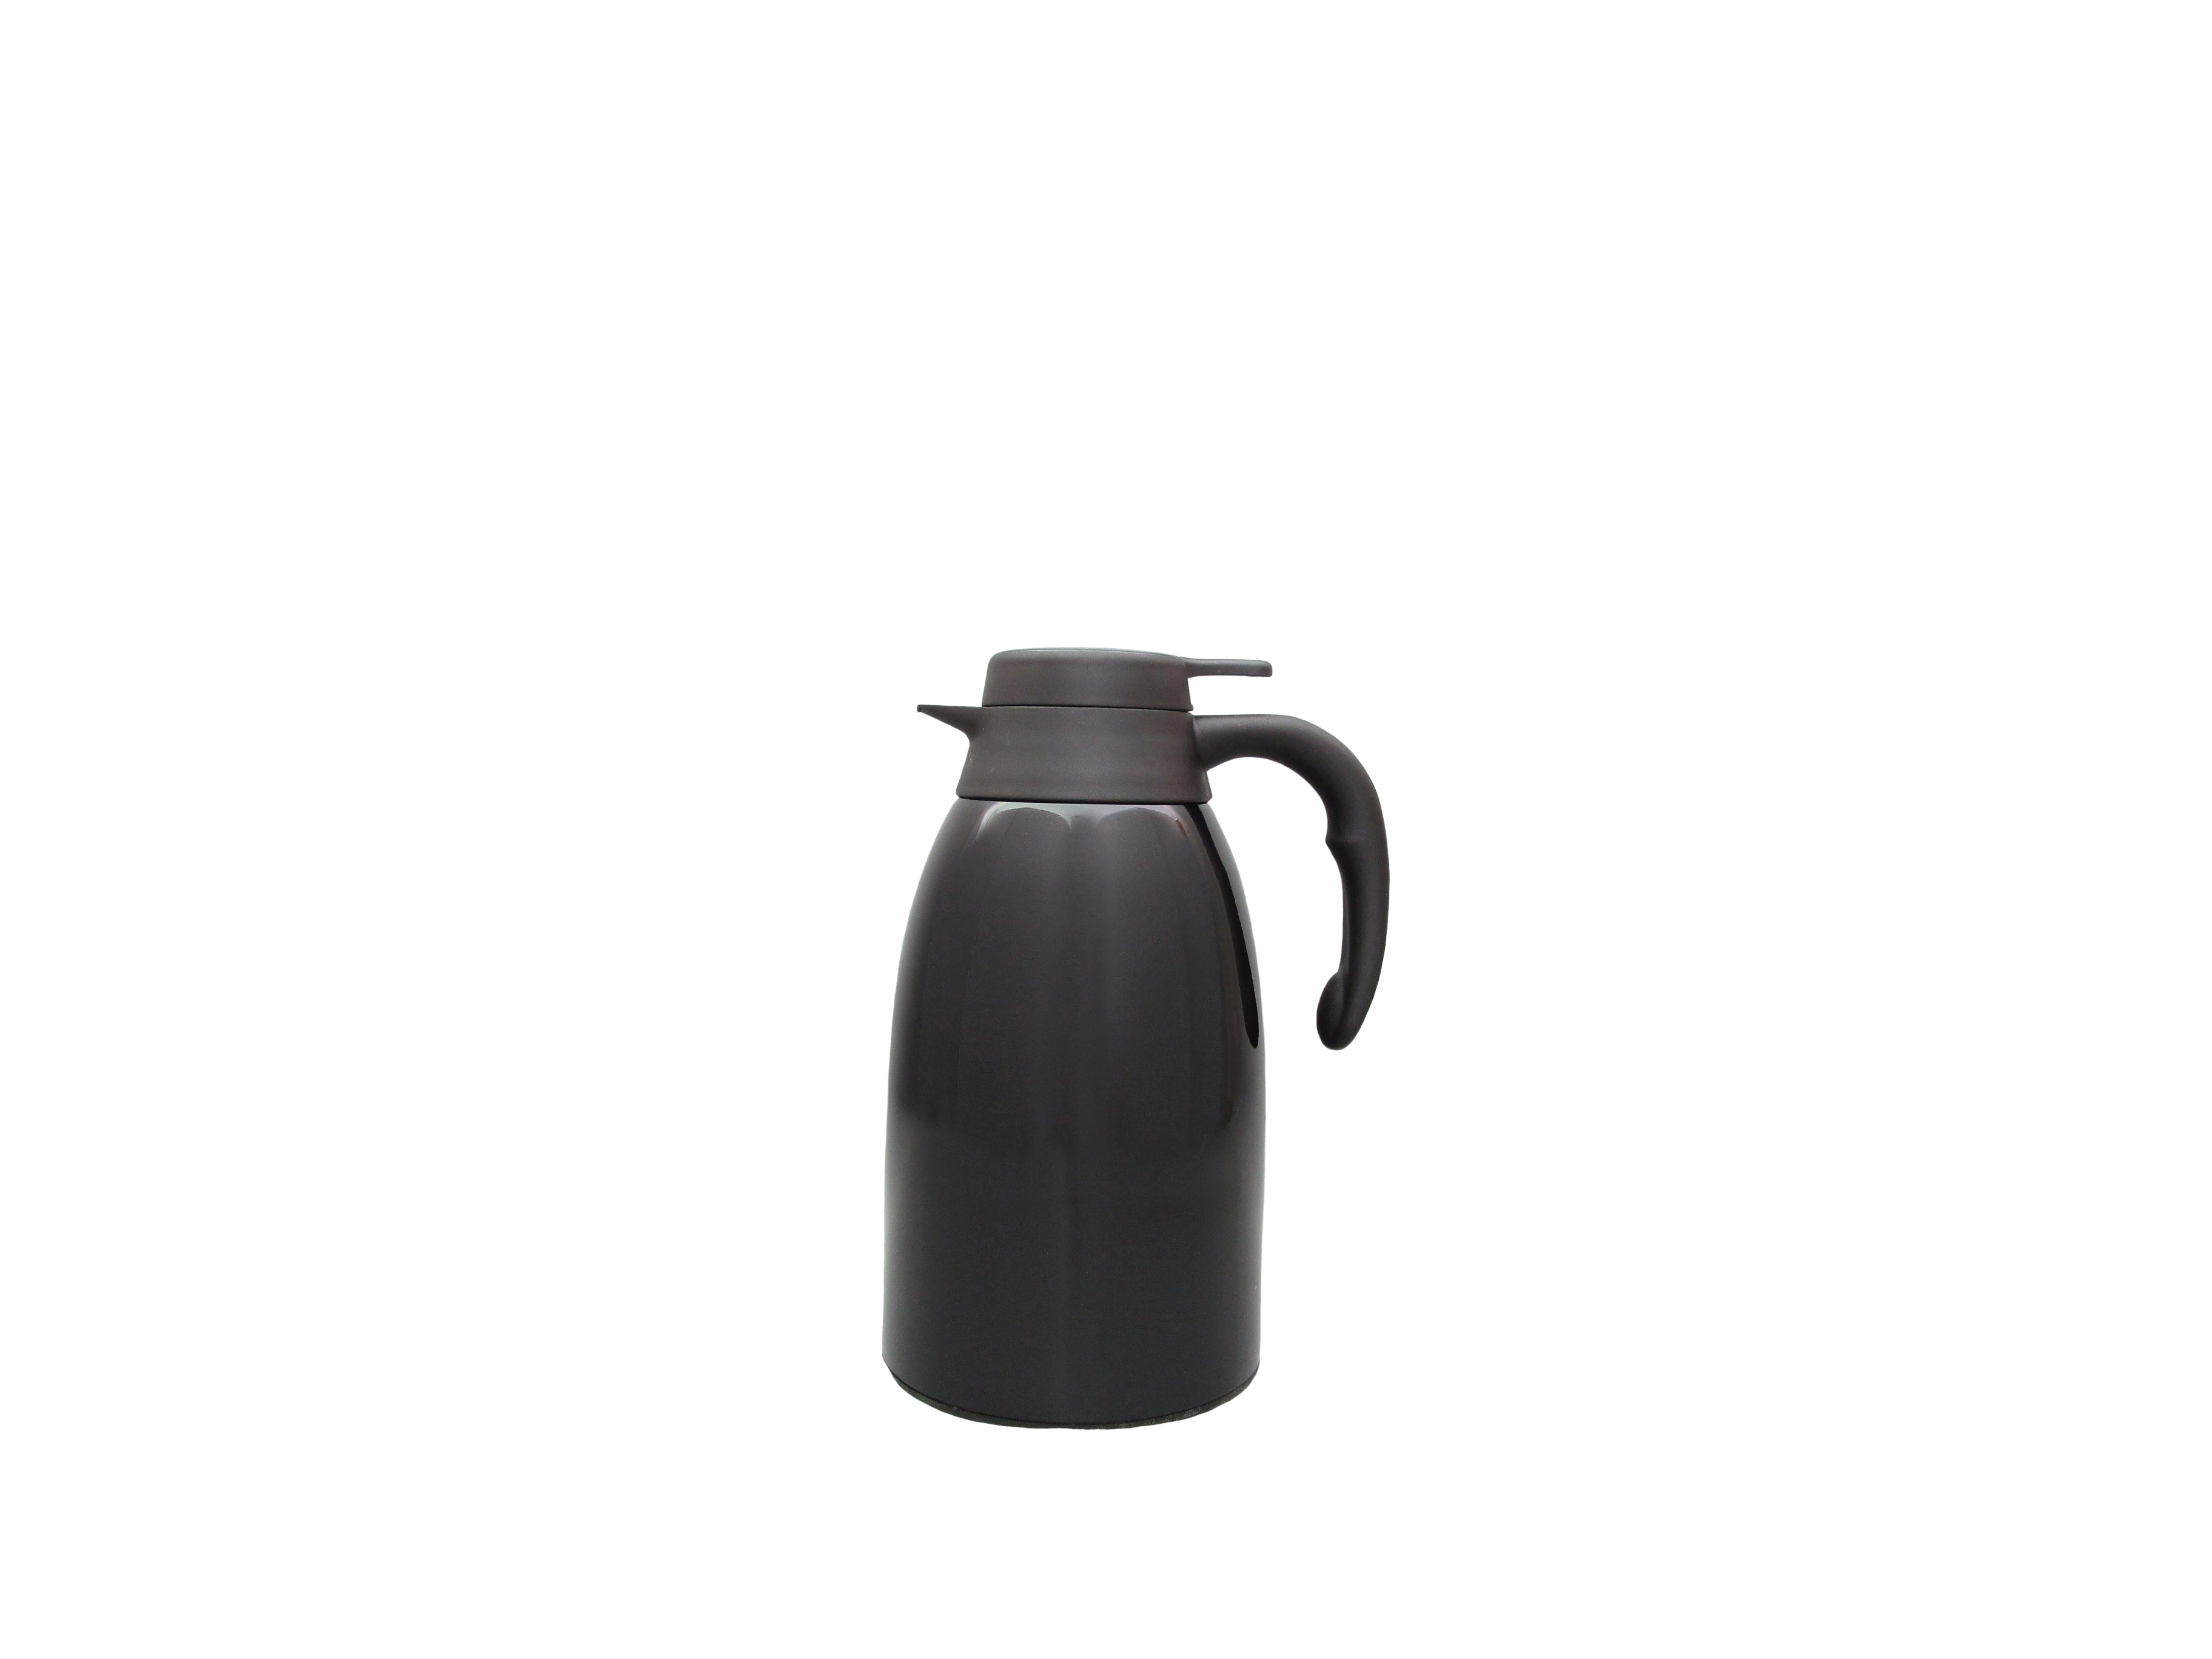 FUJI20-002 - Vacuum carafe SS black unbreakable 2.0 L - Isobel